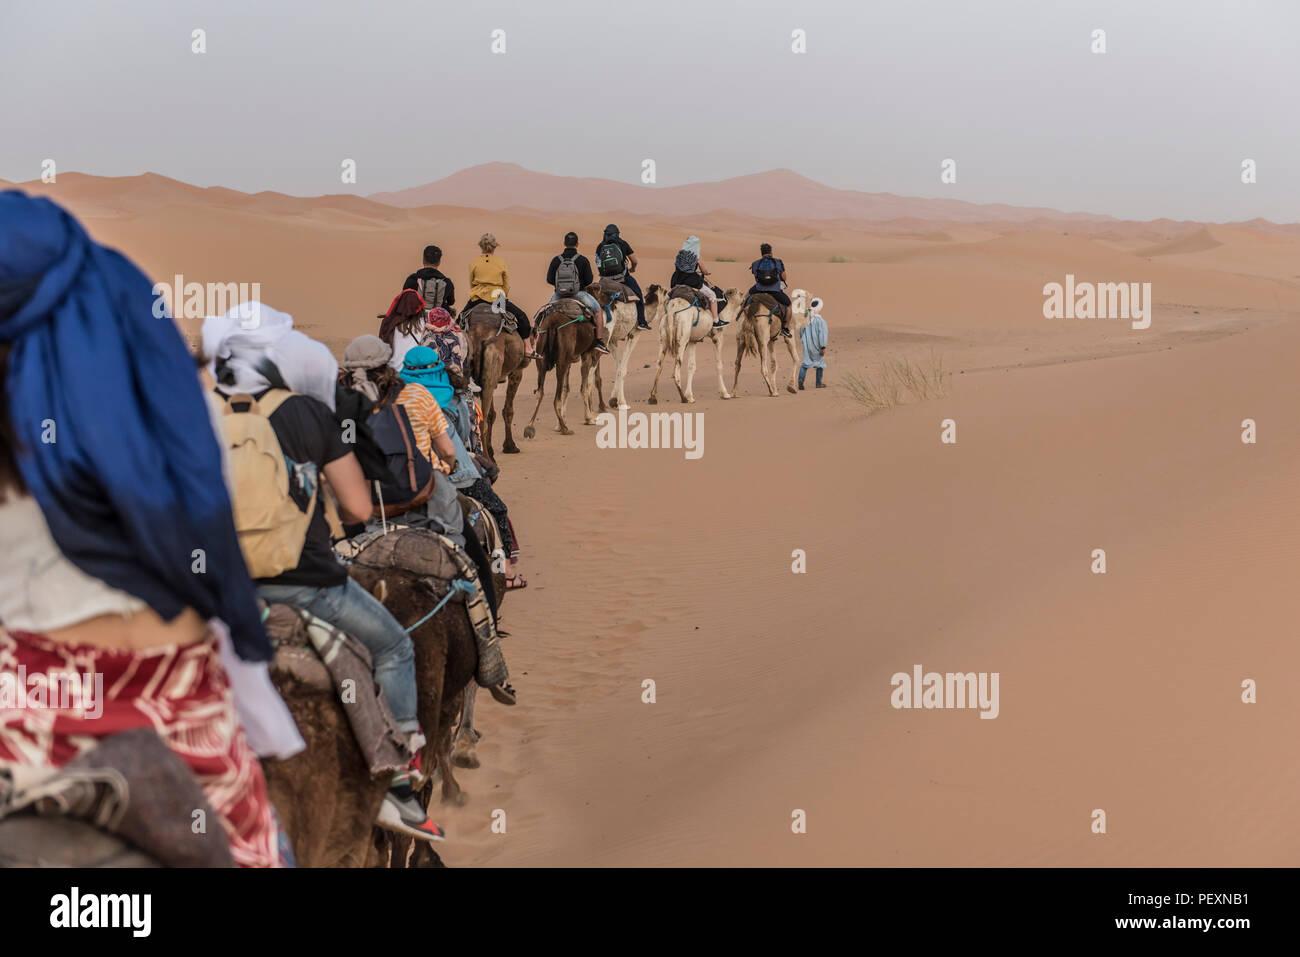 Tourists riding camels in Sahara Desert, Merzouga, Morocco - Stock Image